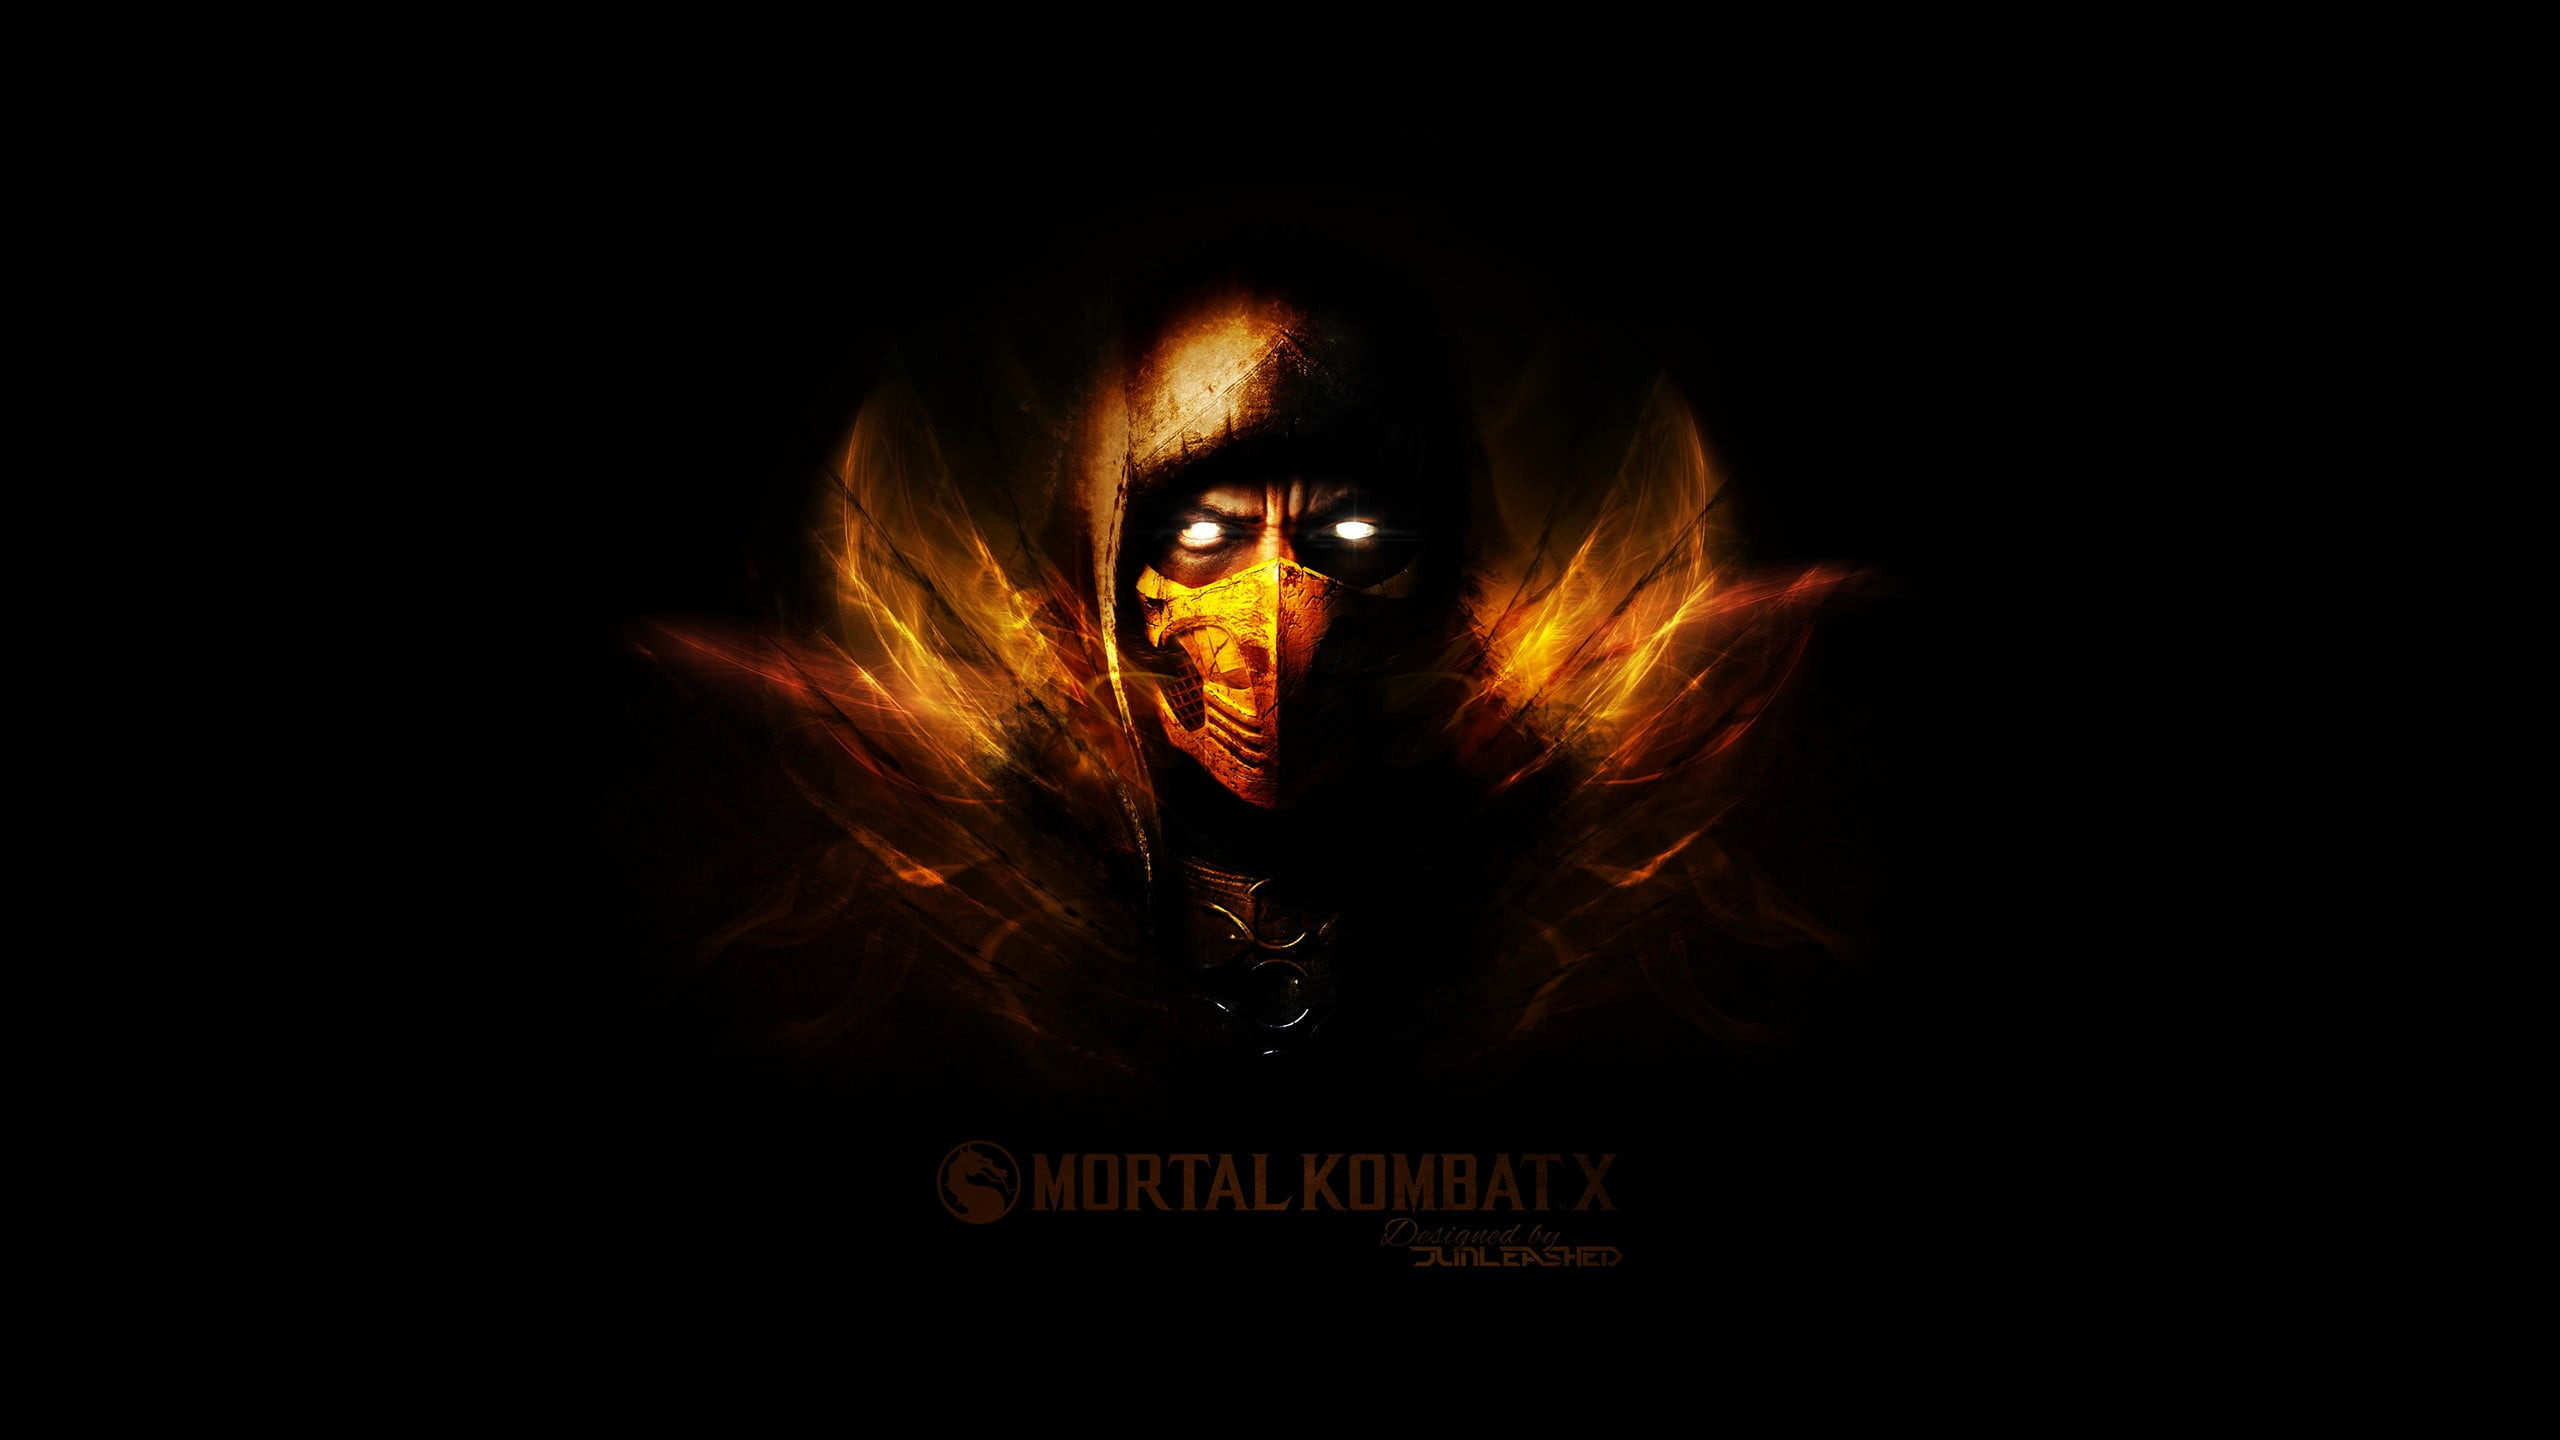 Res: 2560x1440, 1920x1080 Mortal Kombat Scorpion Wallpapers HD